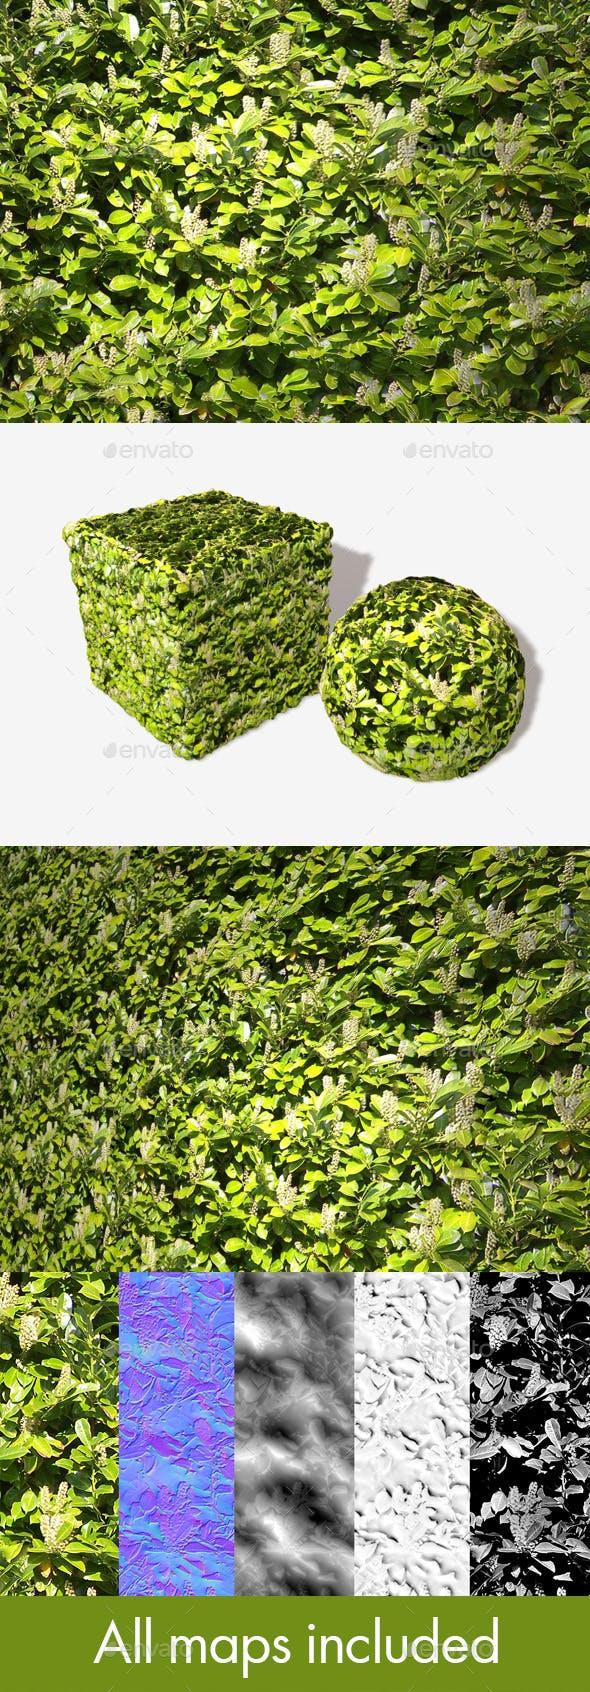 White Flowering Bush Seamless Texture - 3DOcean Item for Sale